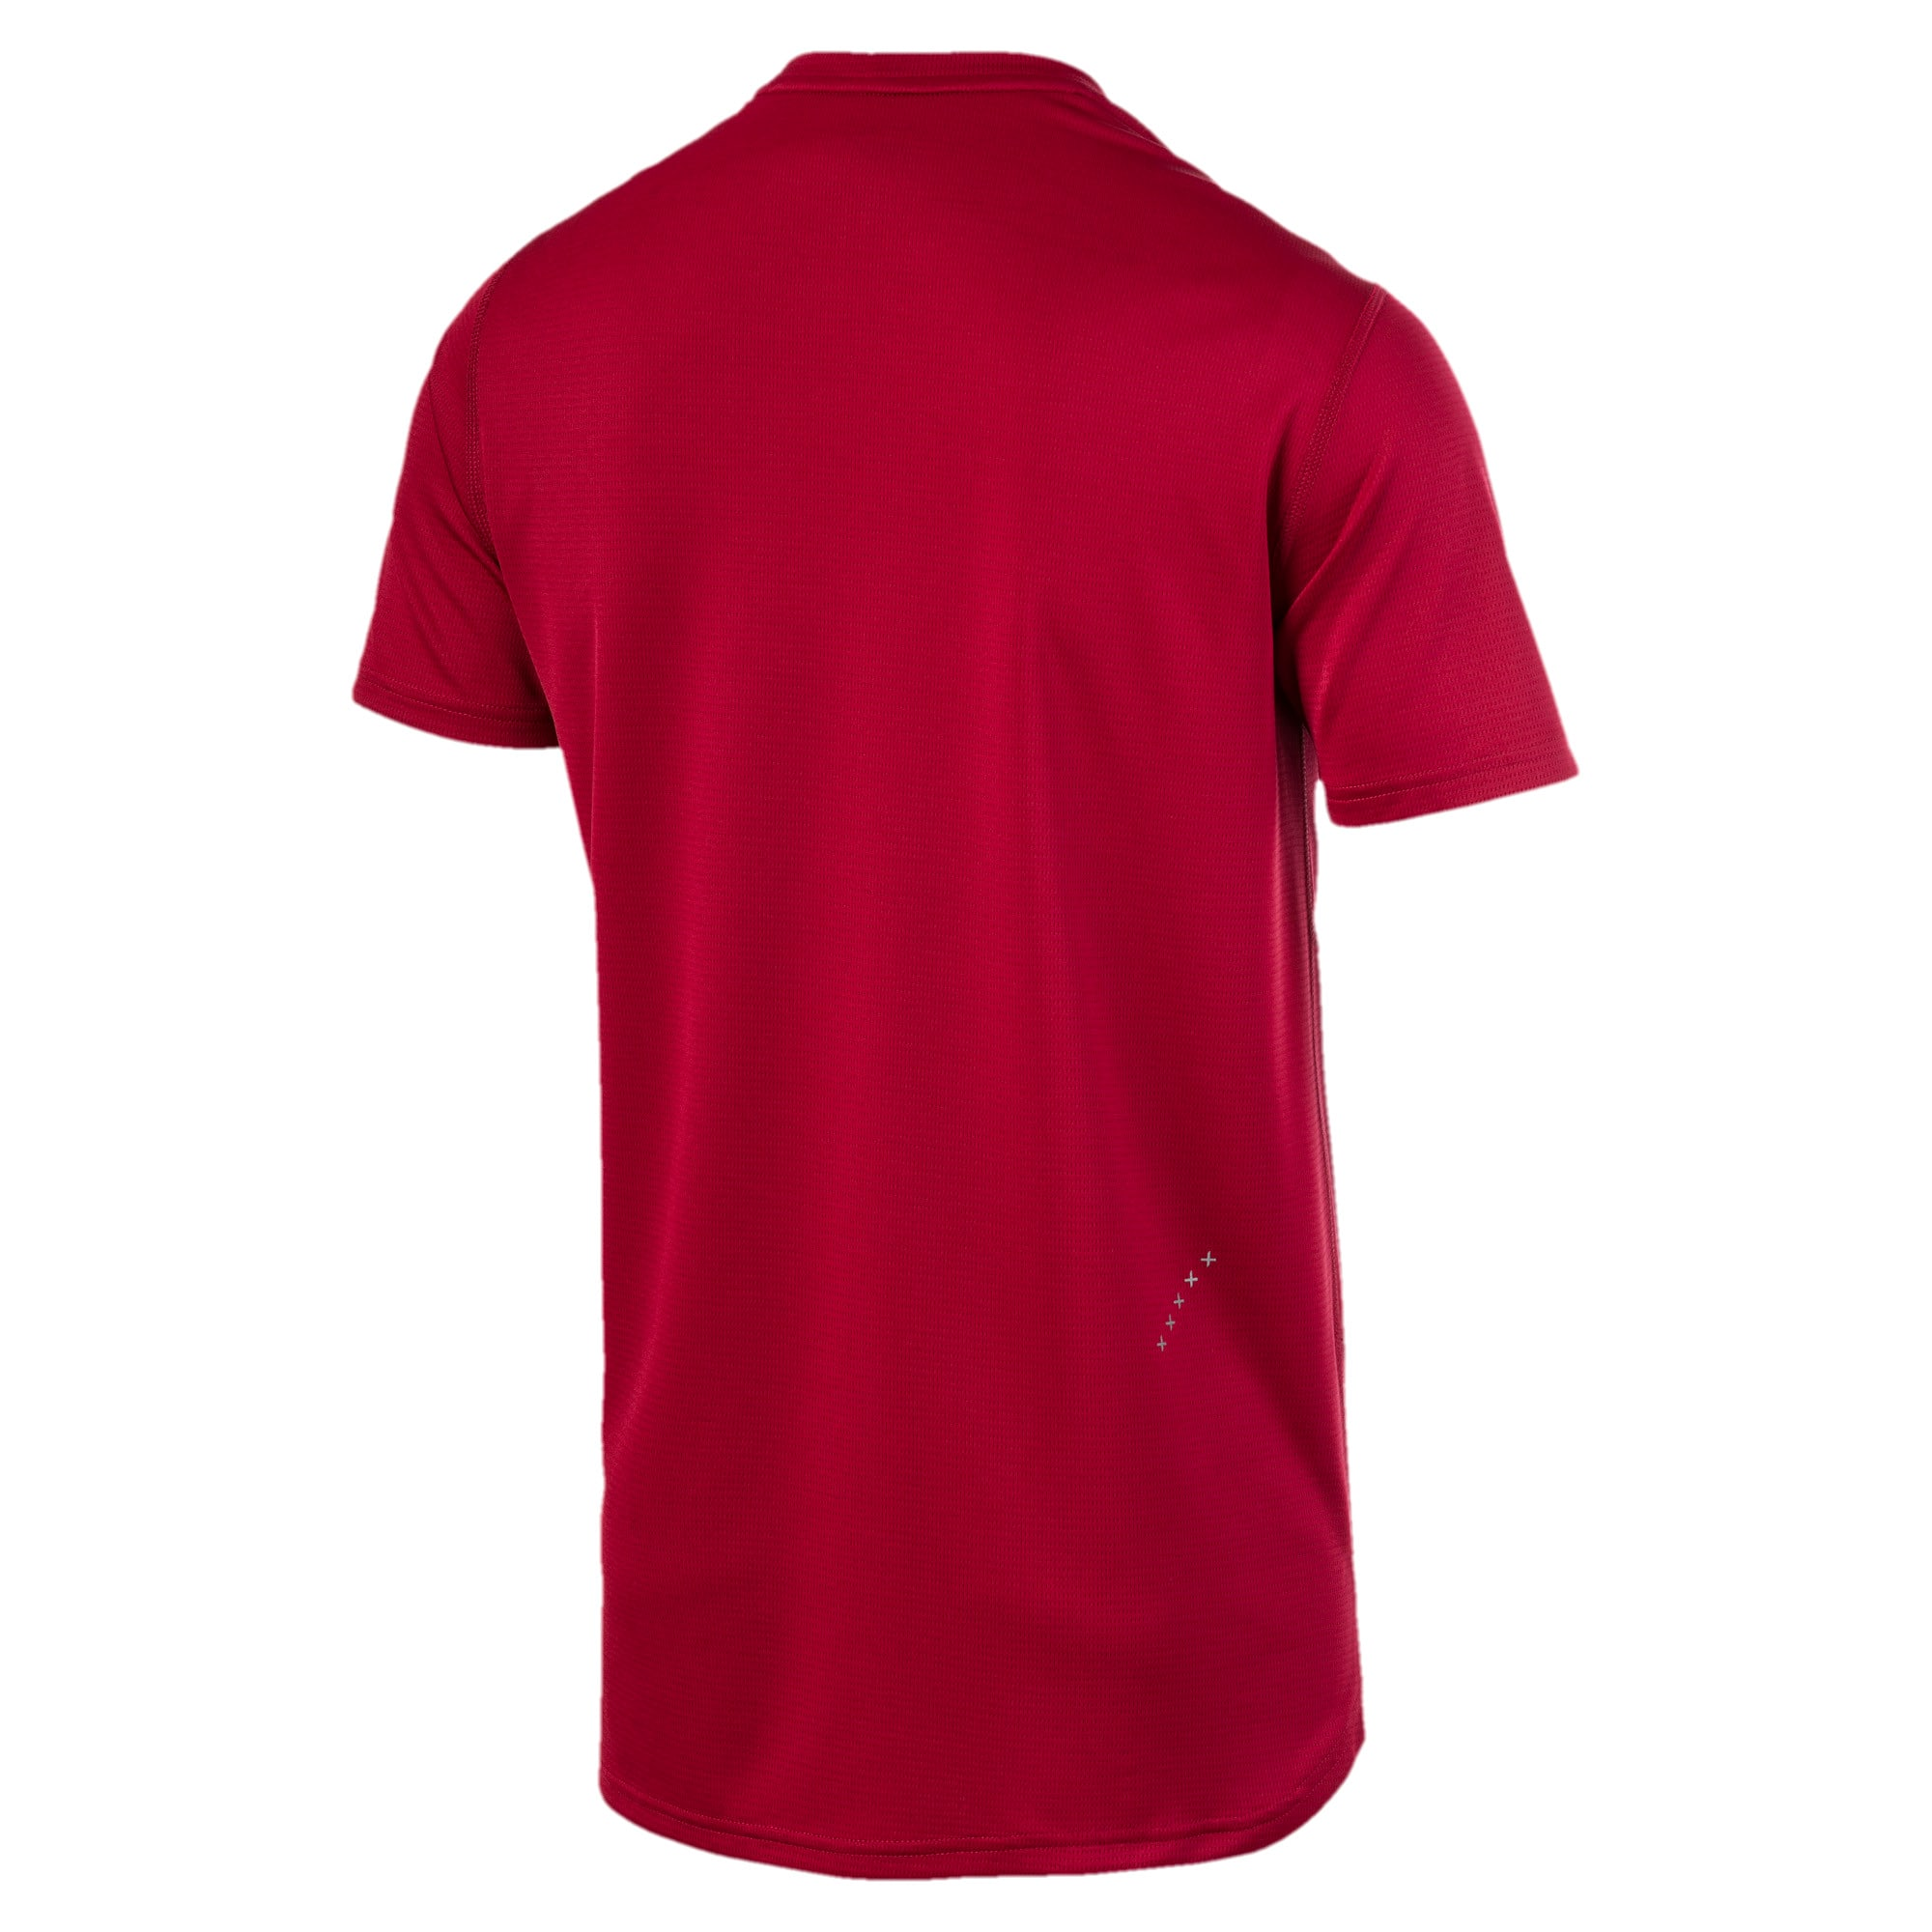 Thumbnail 5 van IGNITE hardloopshirt voor mannen, Rhubarb, medium